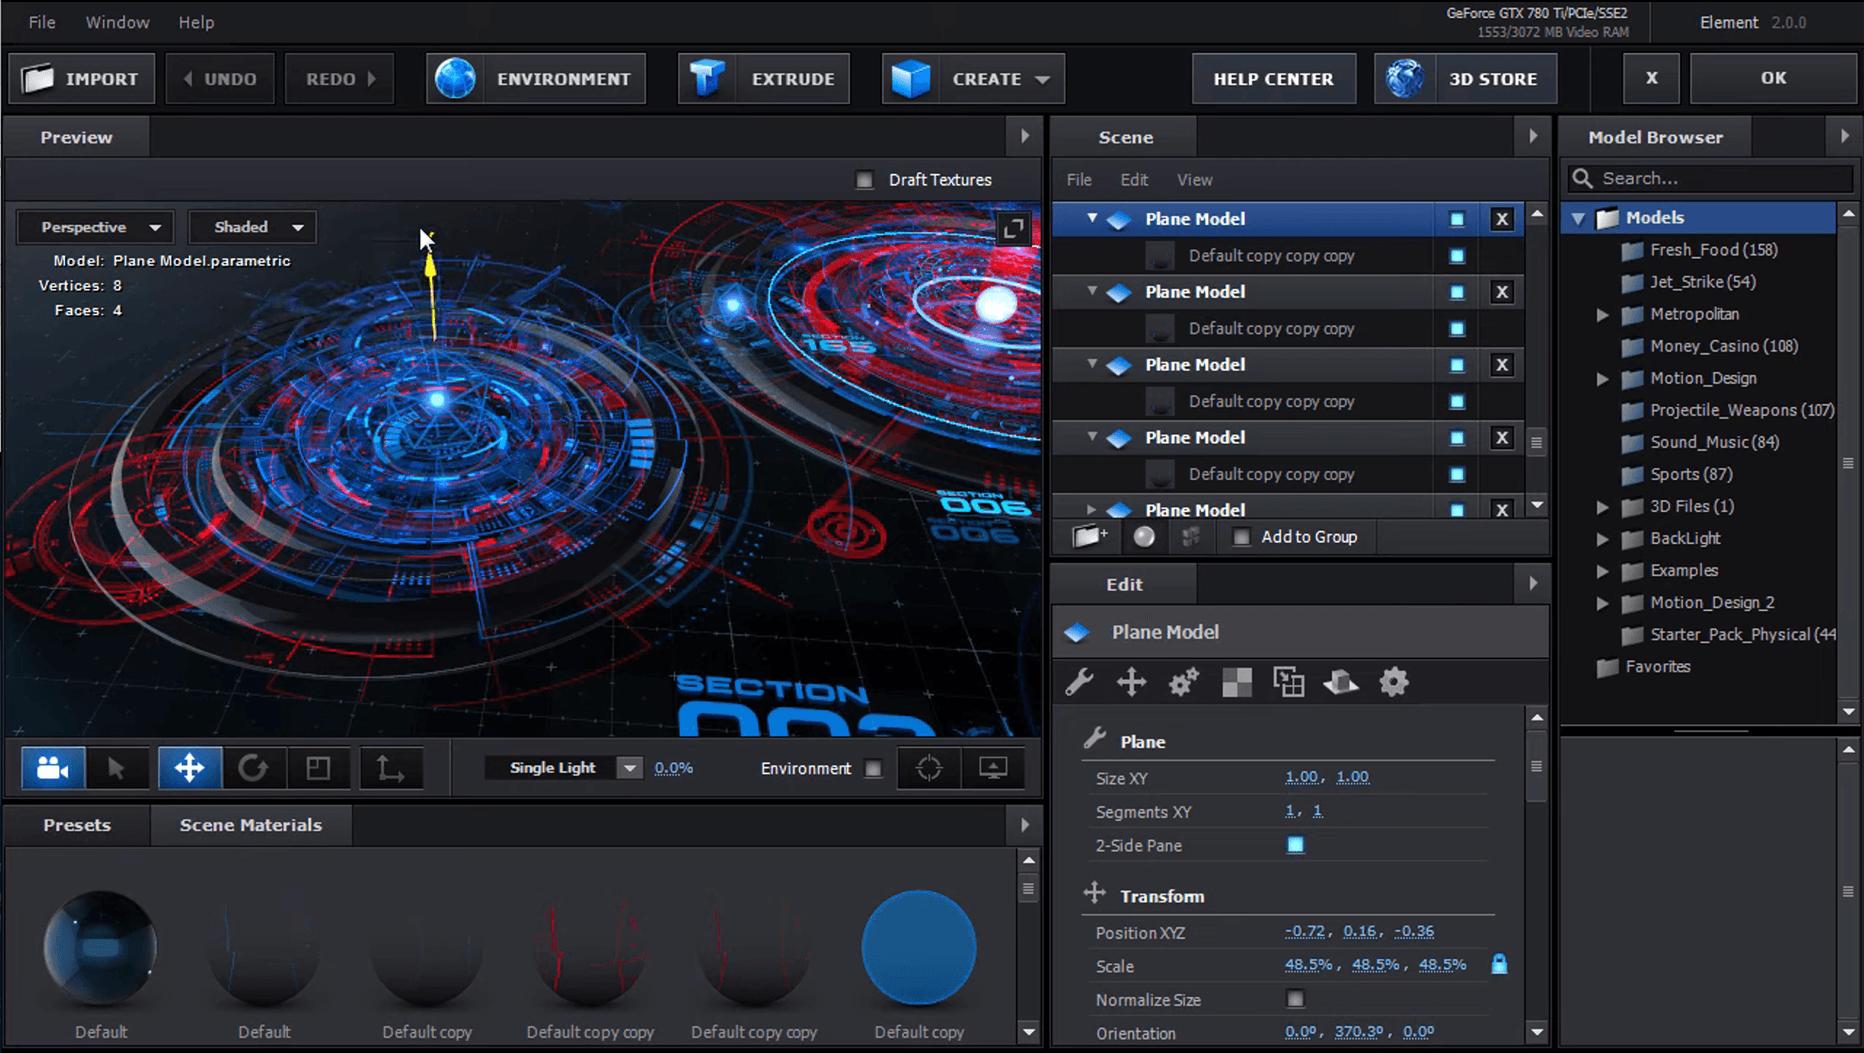 Element 3D Scene Setup